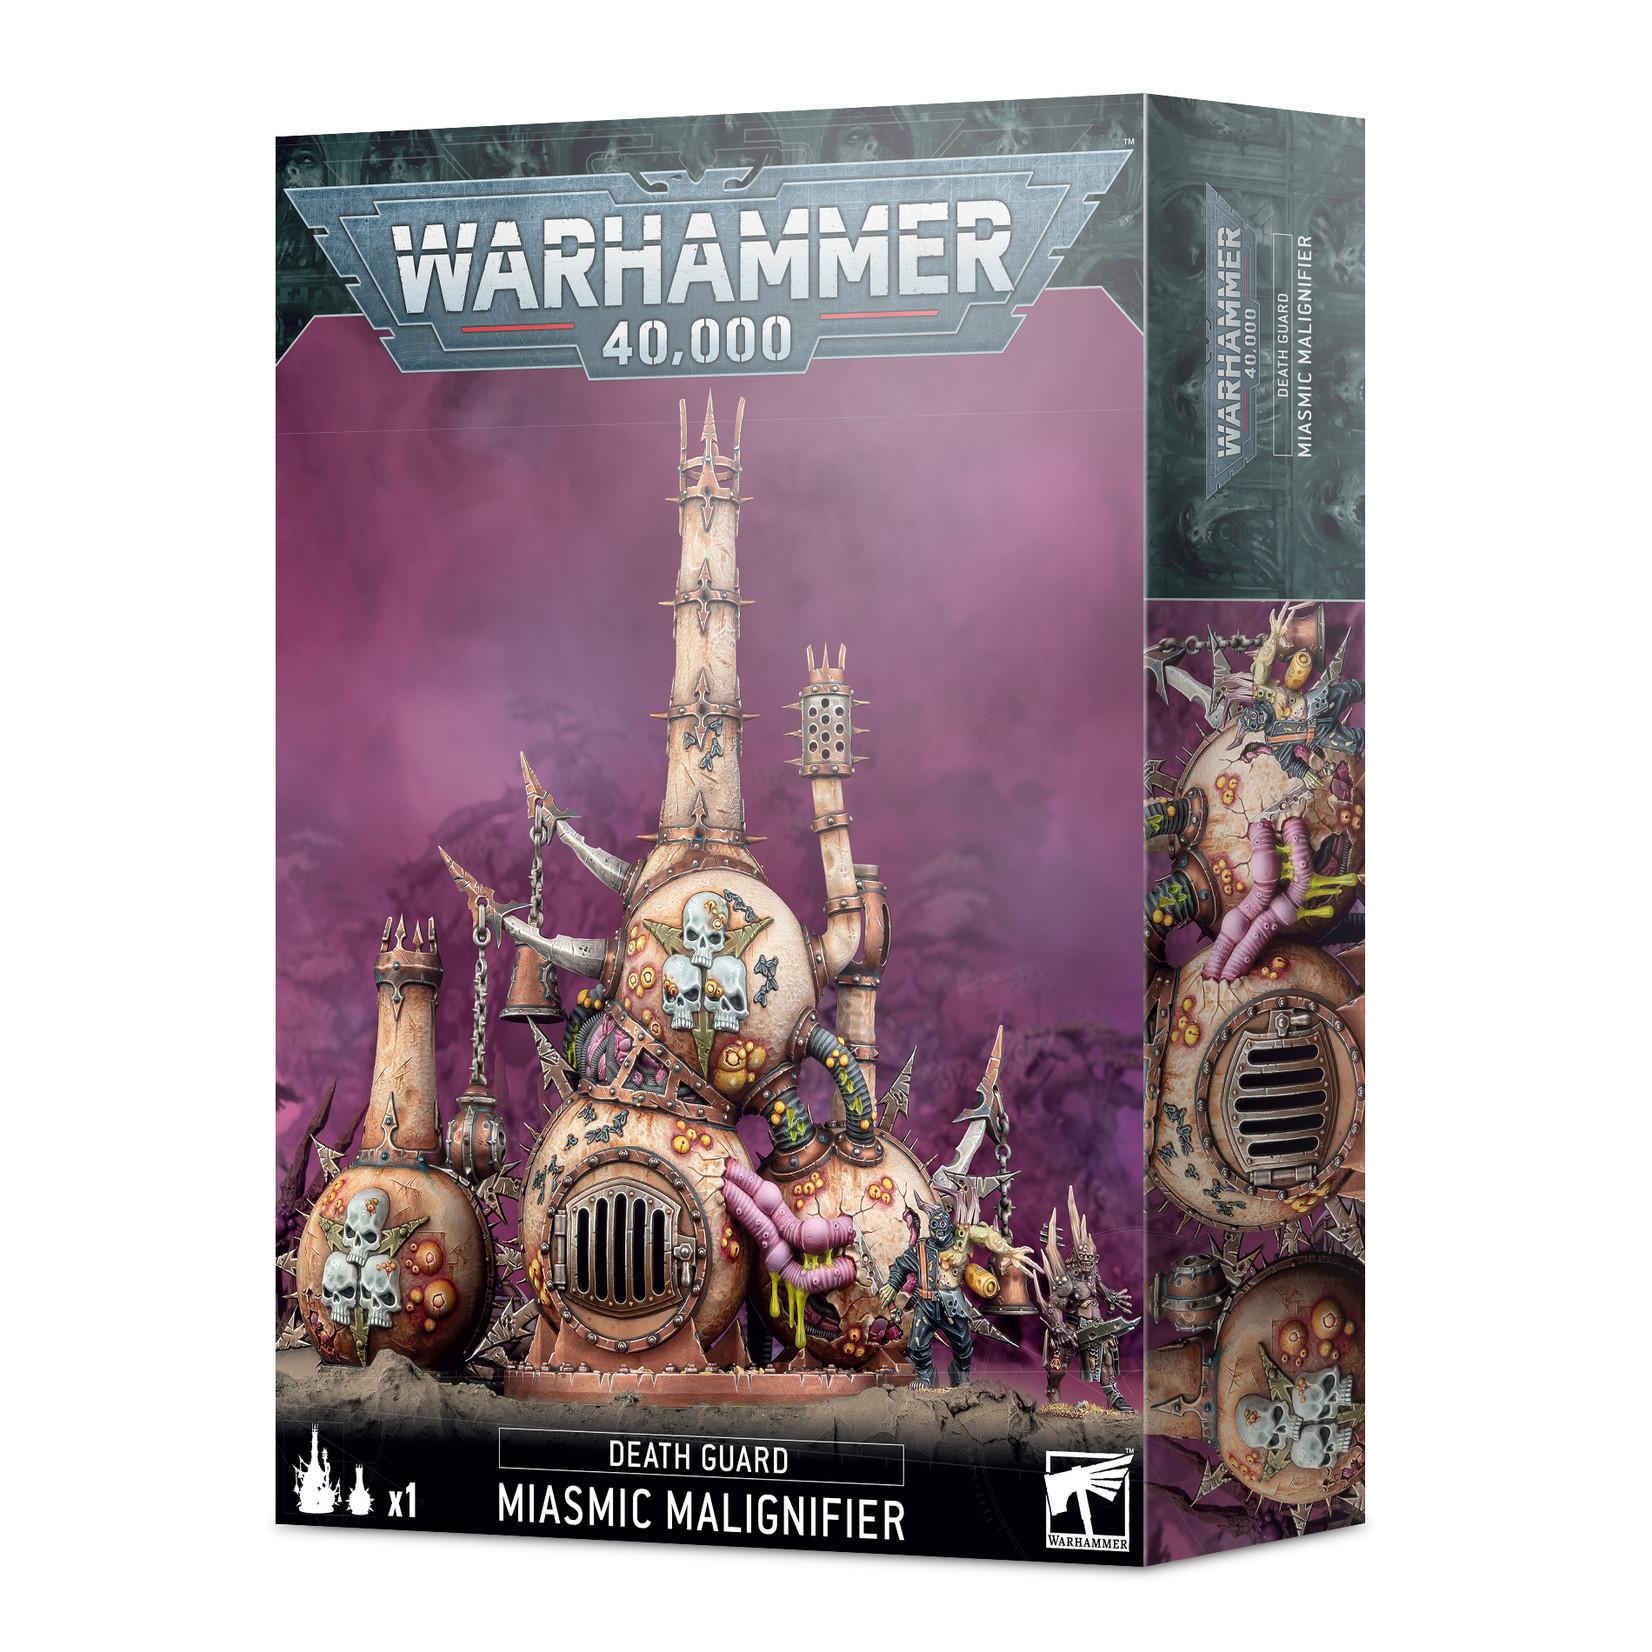 Death Guard Miasmic Malignifier (40K)